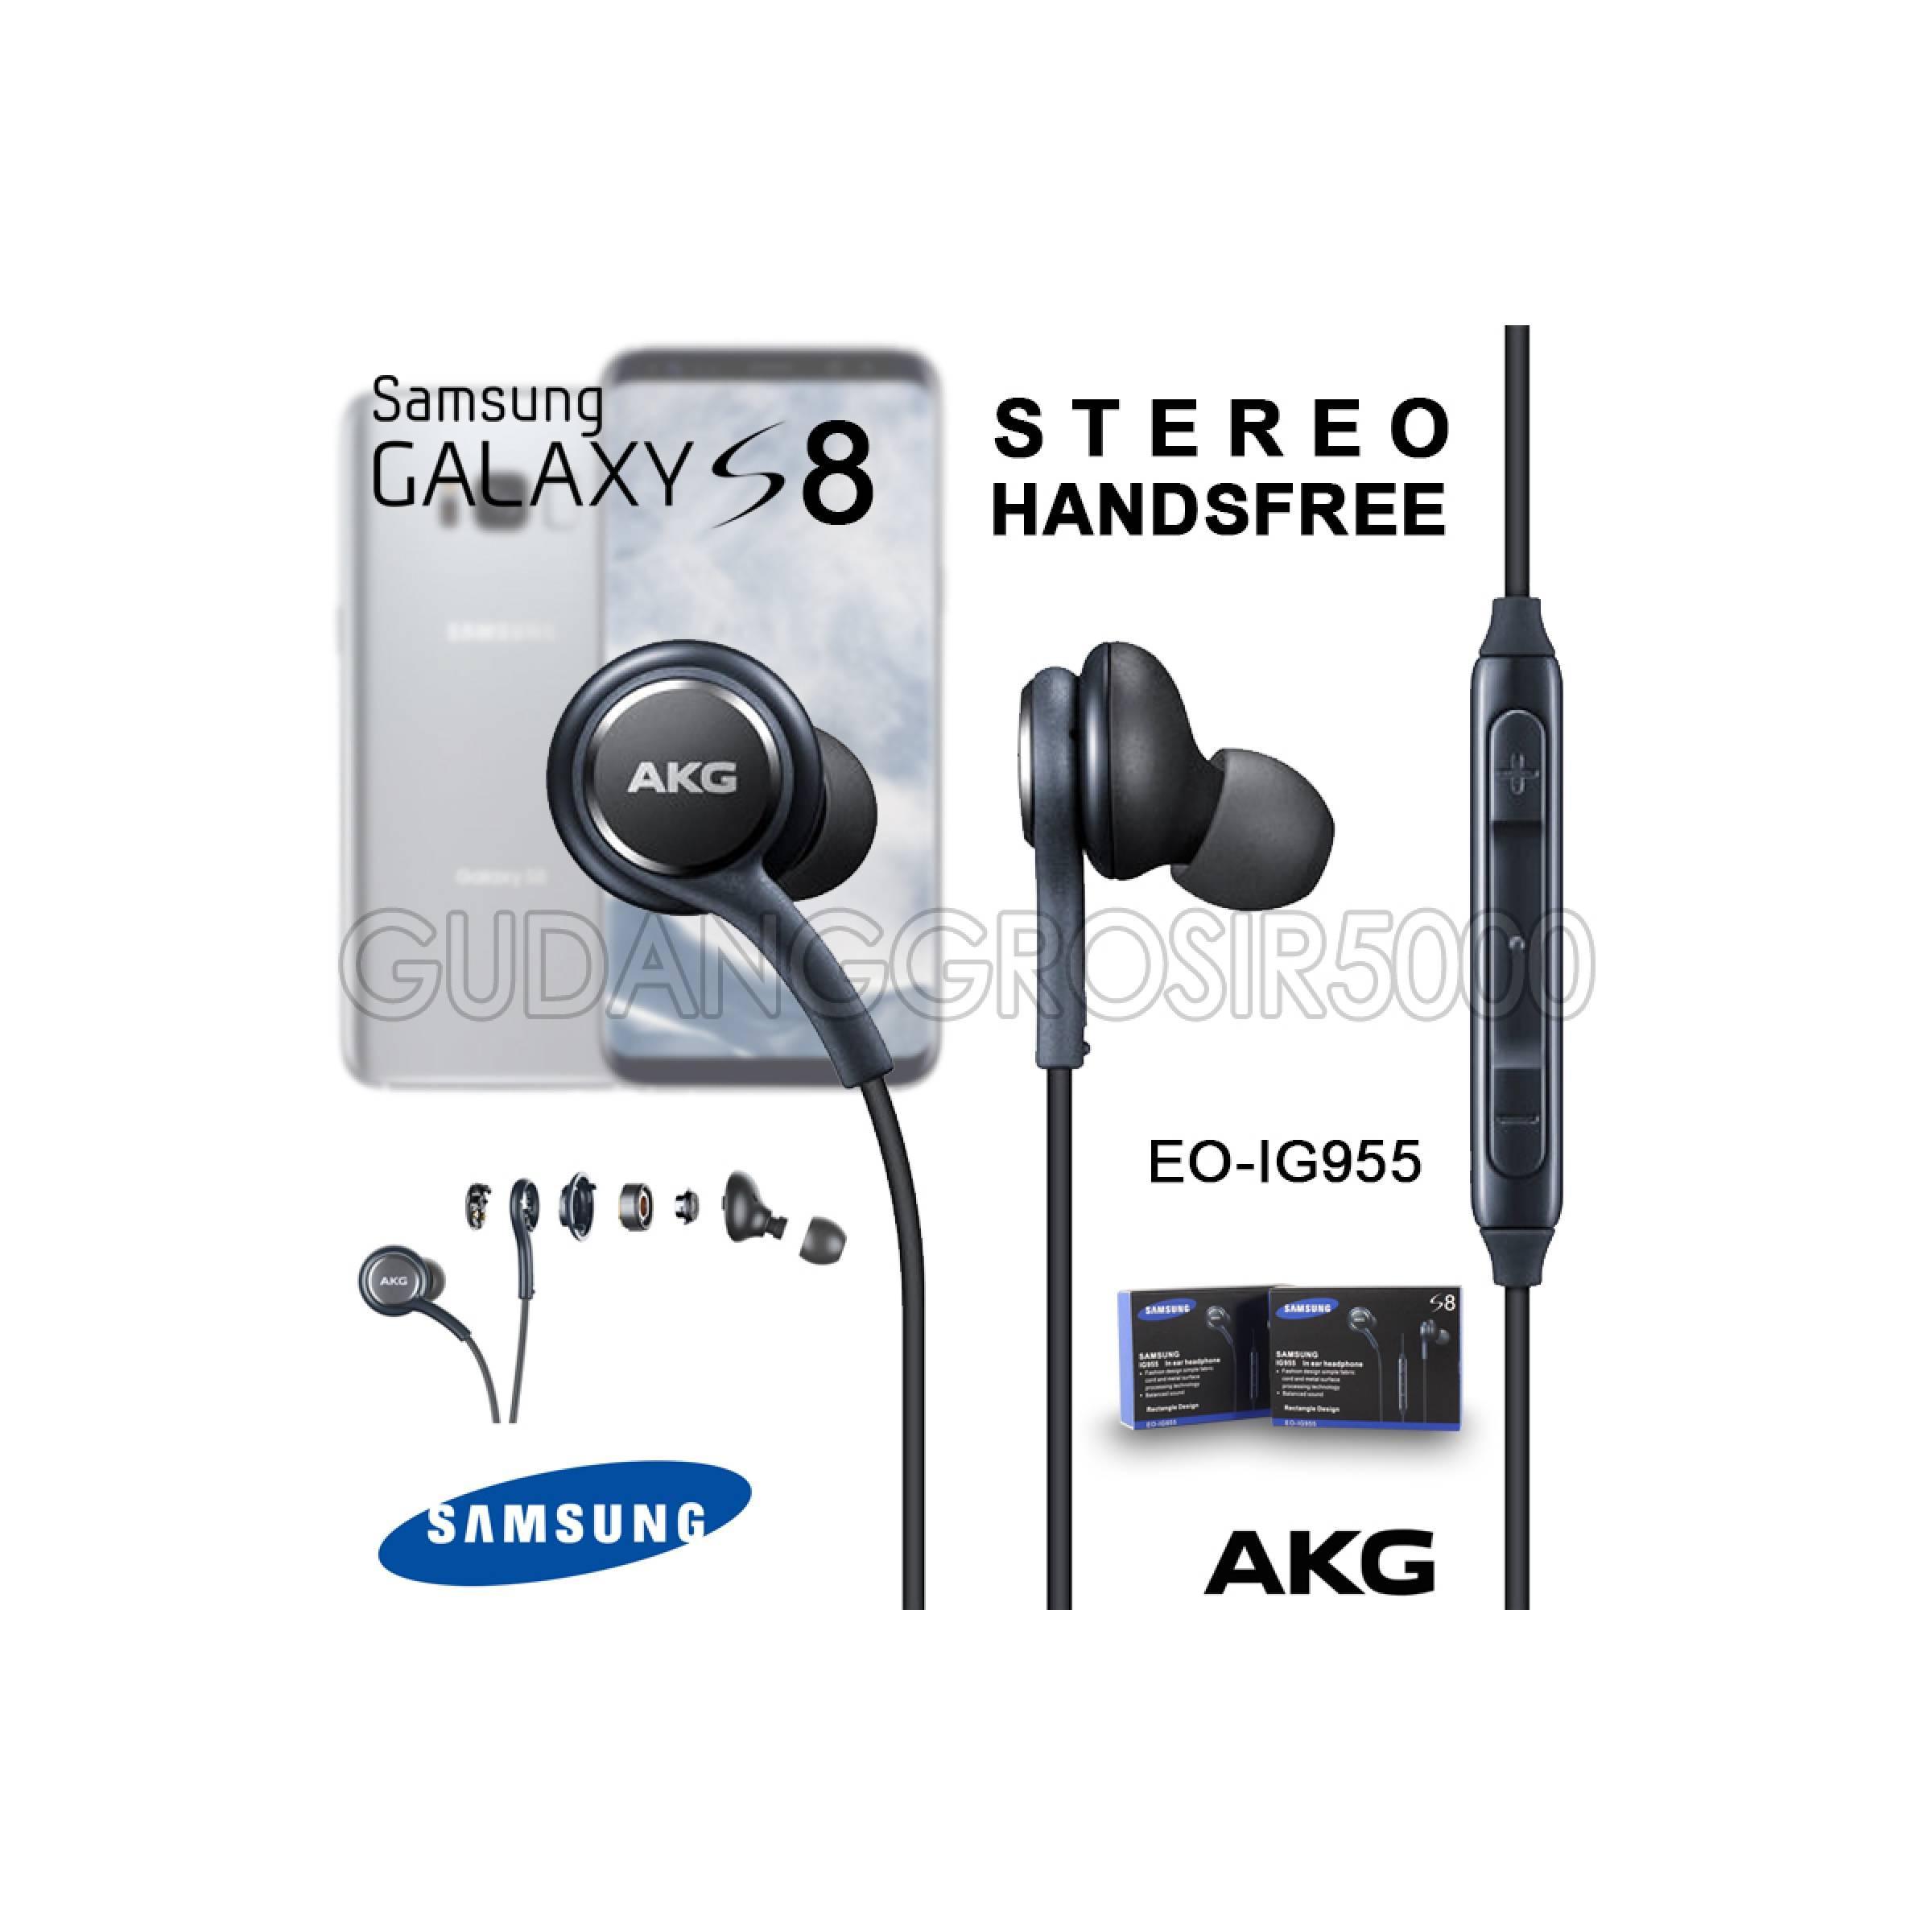 Hf handsfree earphone headset samsung s8 + plus design by AKG IG955